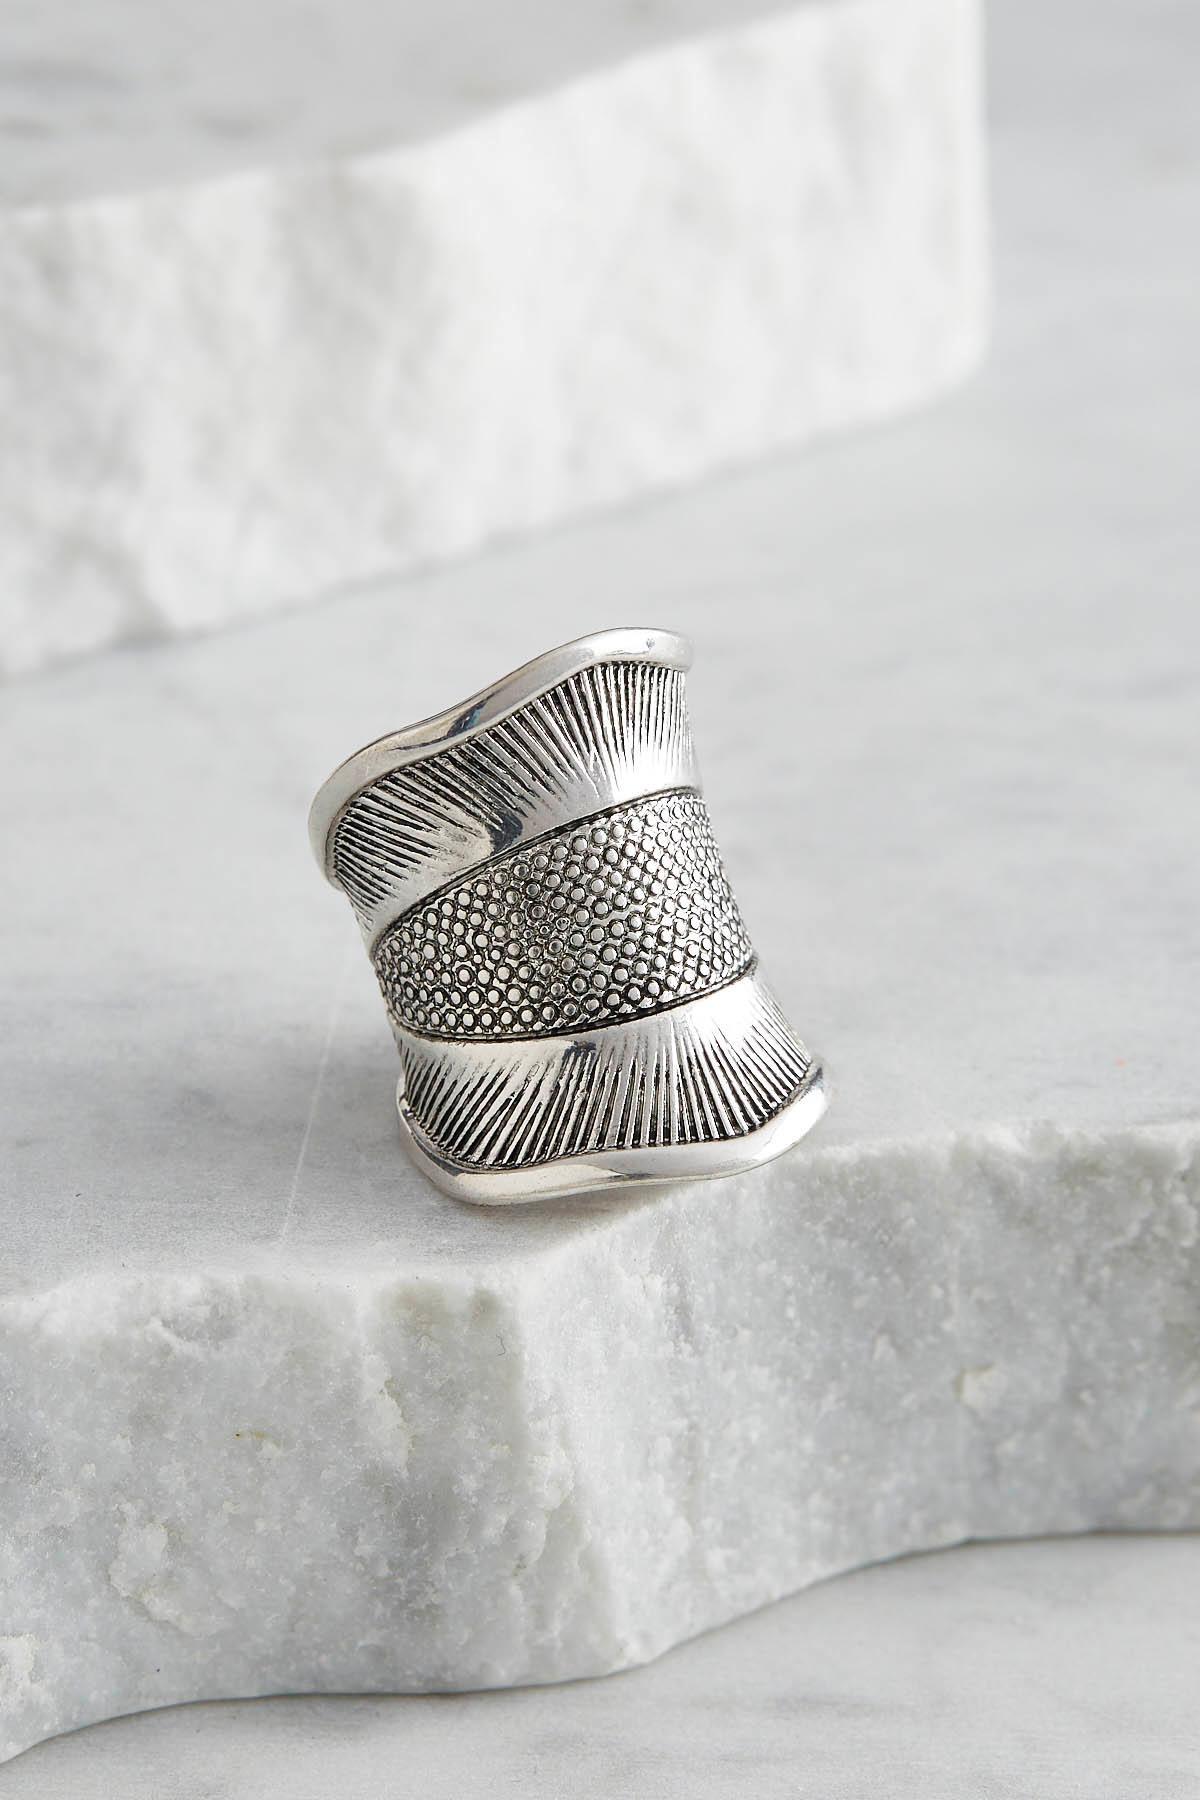 Southwestern Spoon Ring